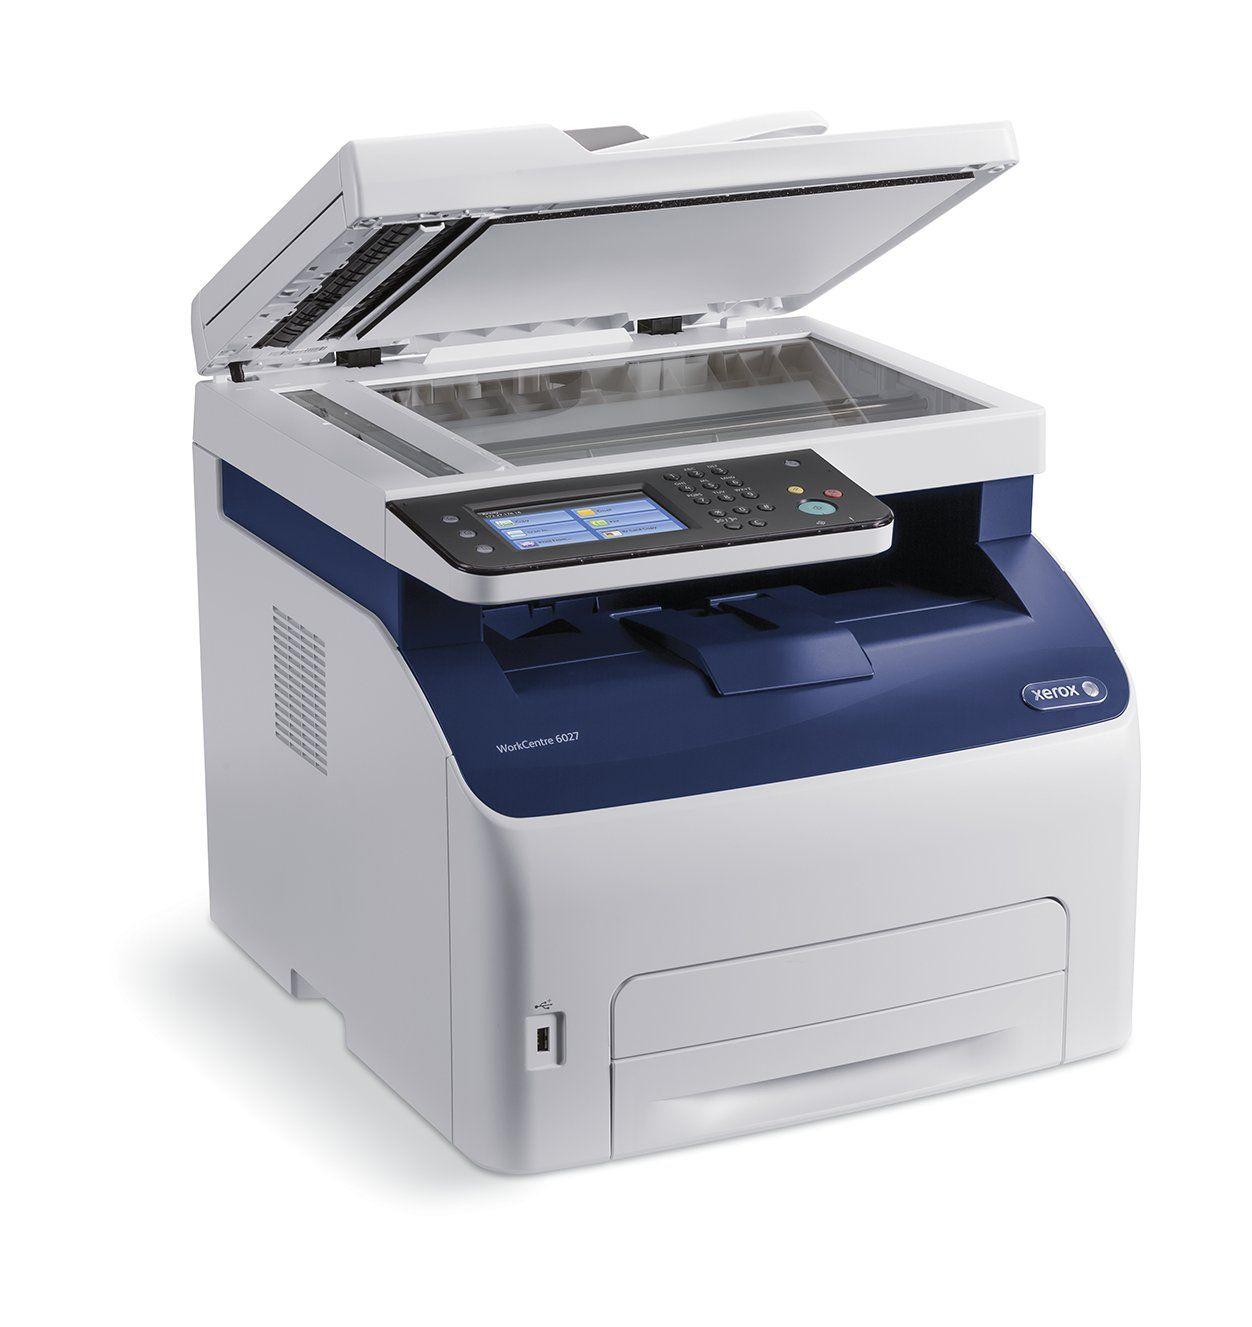 Xerox Workcentre 6027 Ni Wireless Color Multifunction Printer